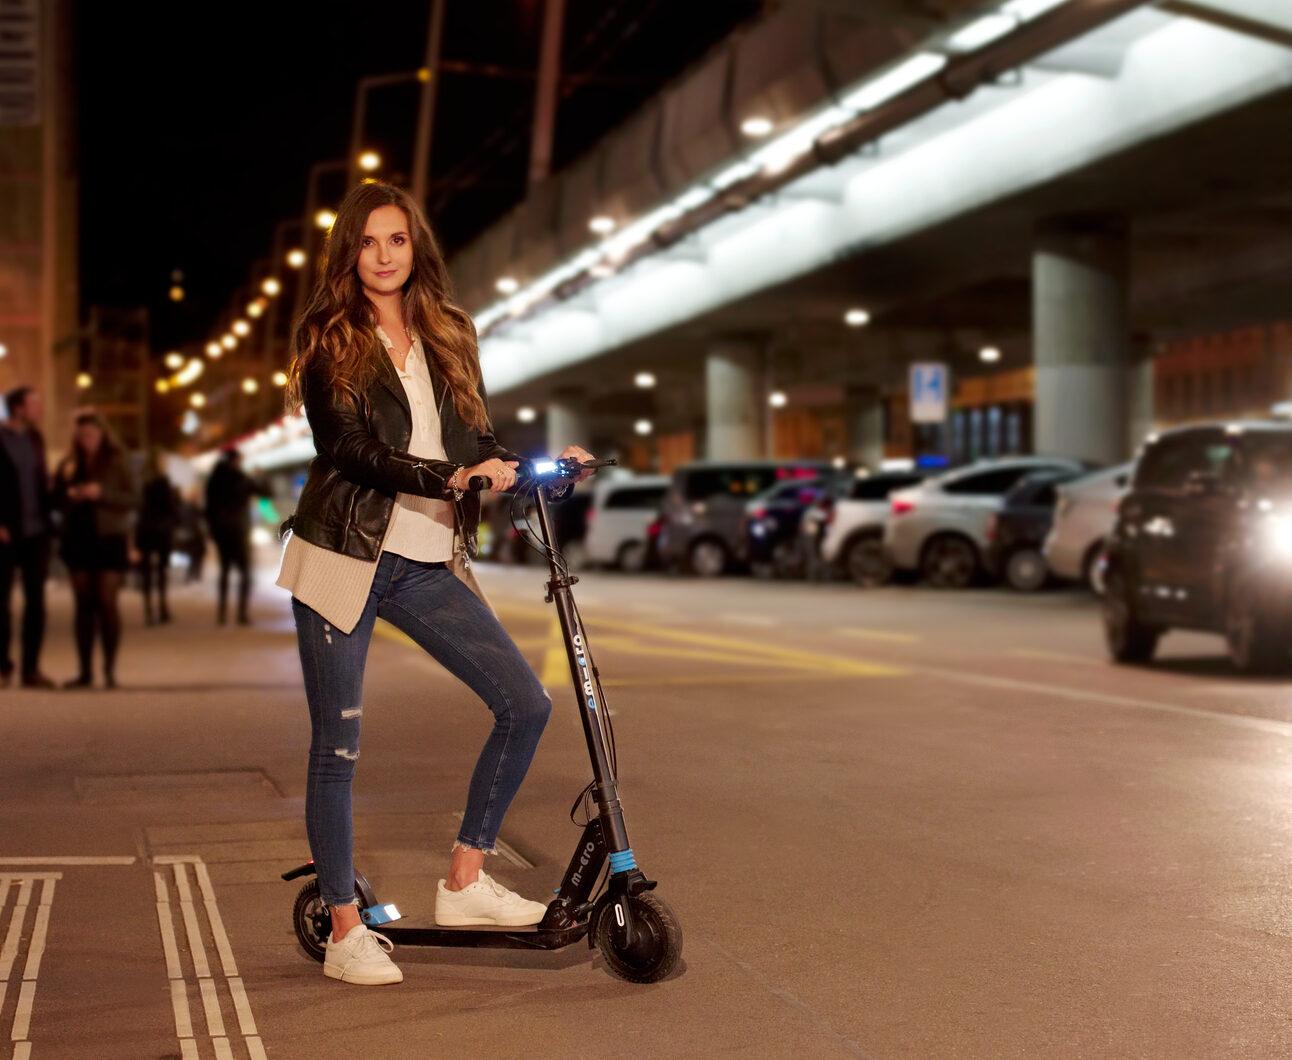 Image femme sur trottinette Micro Merlin en ville